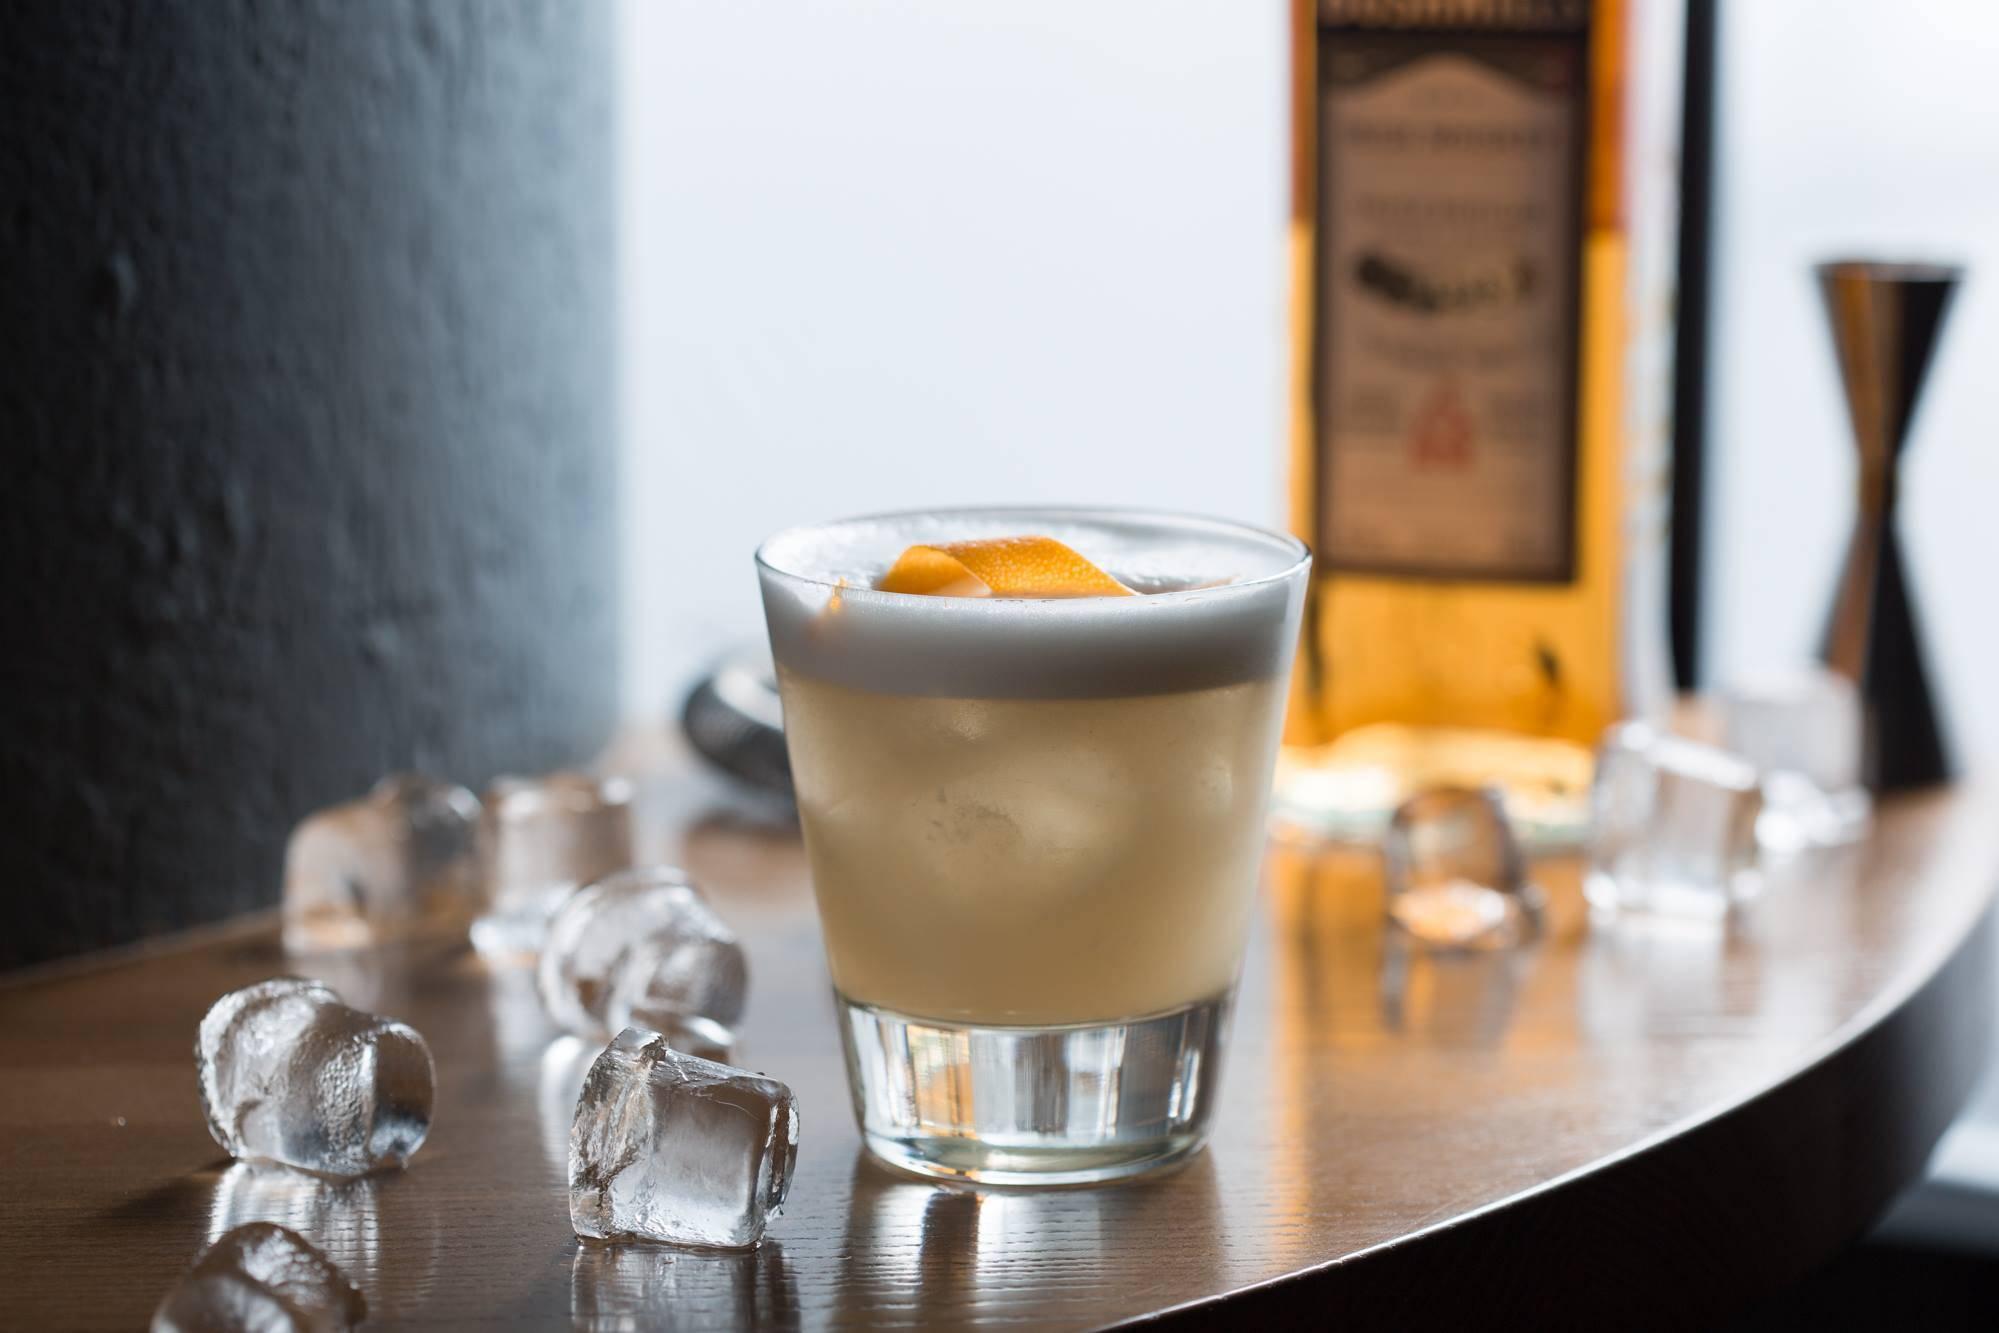 Рецепт виски из самогона в домашних условиях